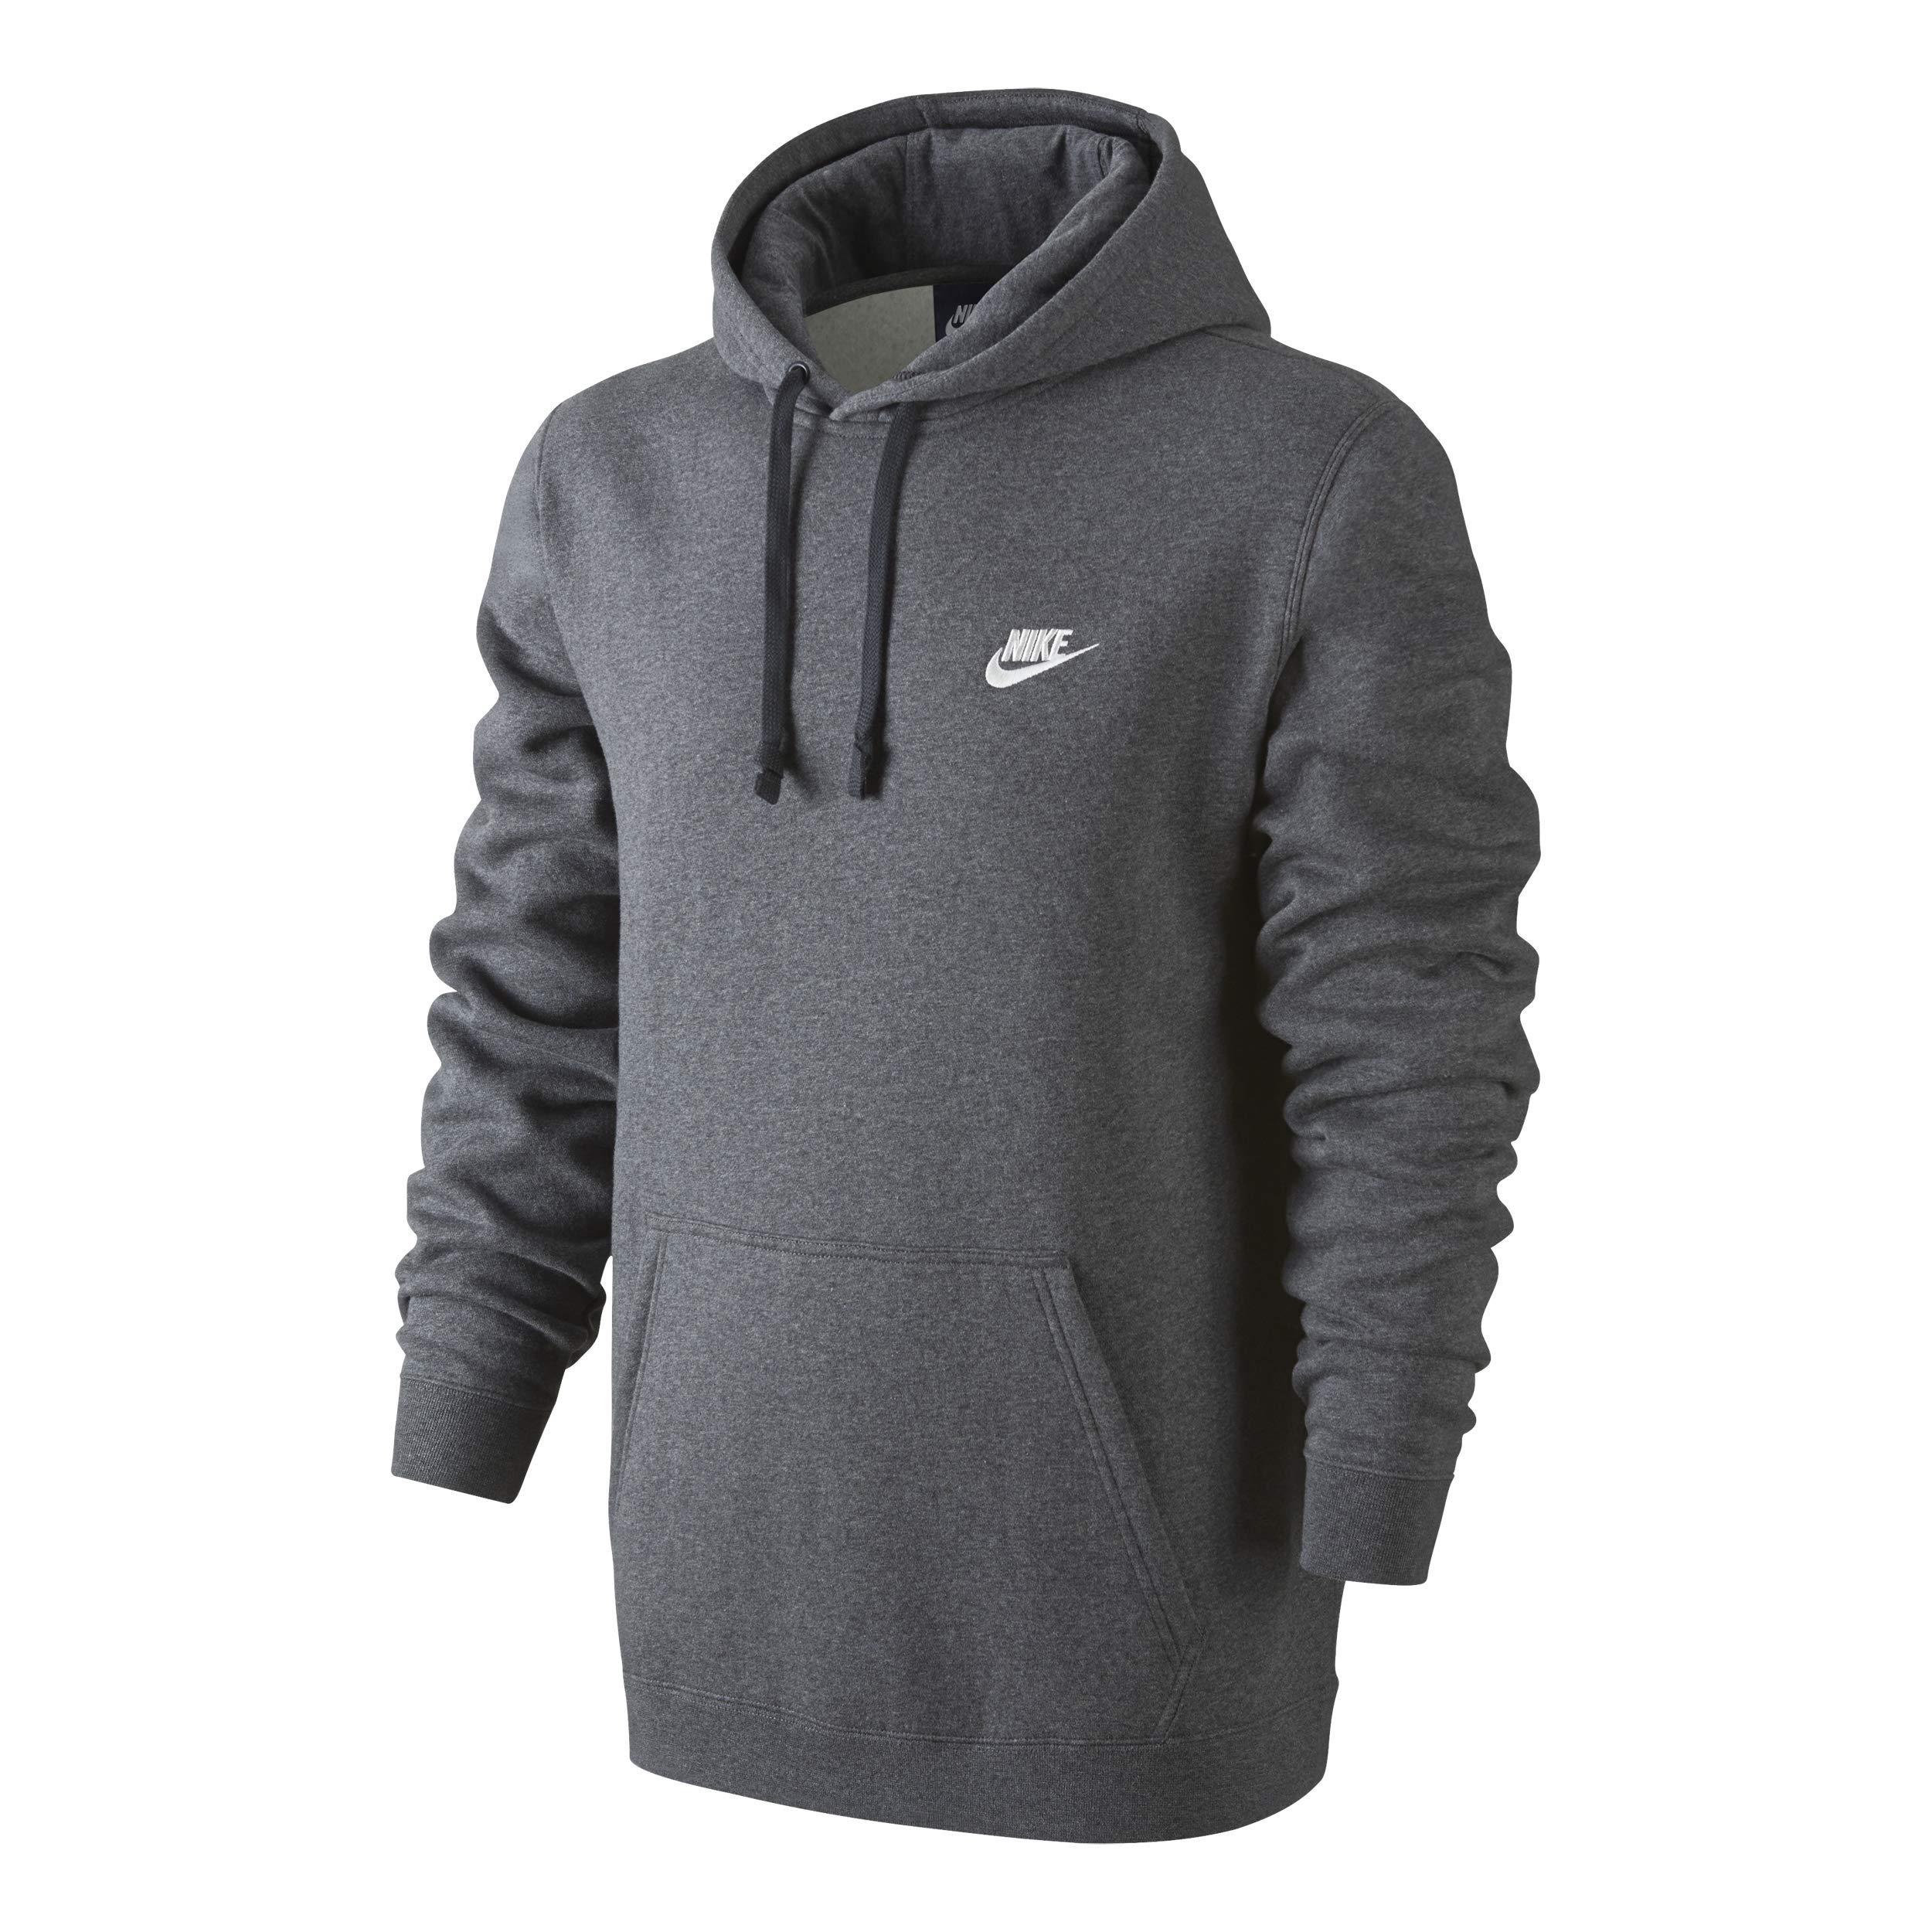 Men's Nike Sportswear Club Pullover Hoodie, Fleece Sweatshirt for Men with Paneled Hood, Charcoal Heather/Charcoal Heather/White, S by Nike (Image #1)